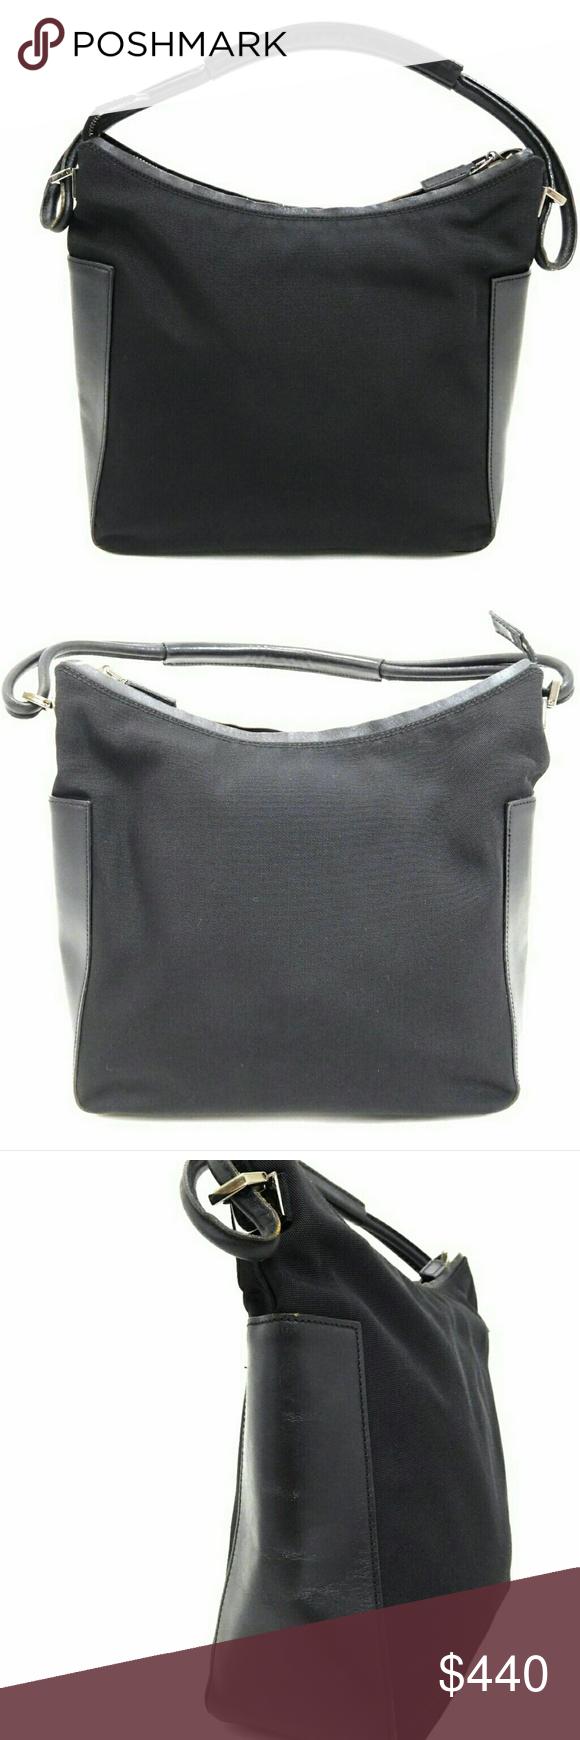 Gucci Leather Tote Satchel Vinatge Black Nylon Leather totes